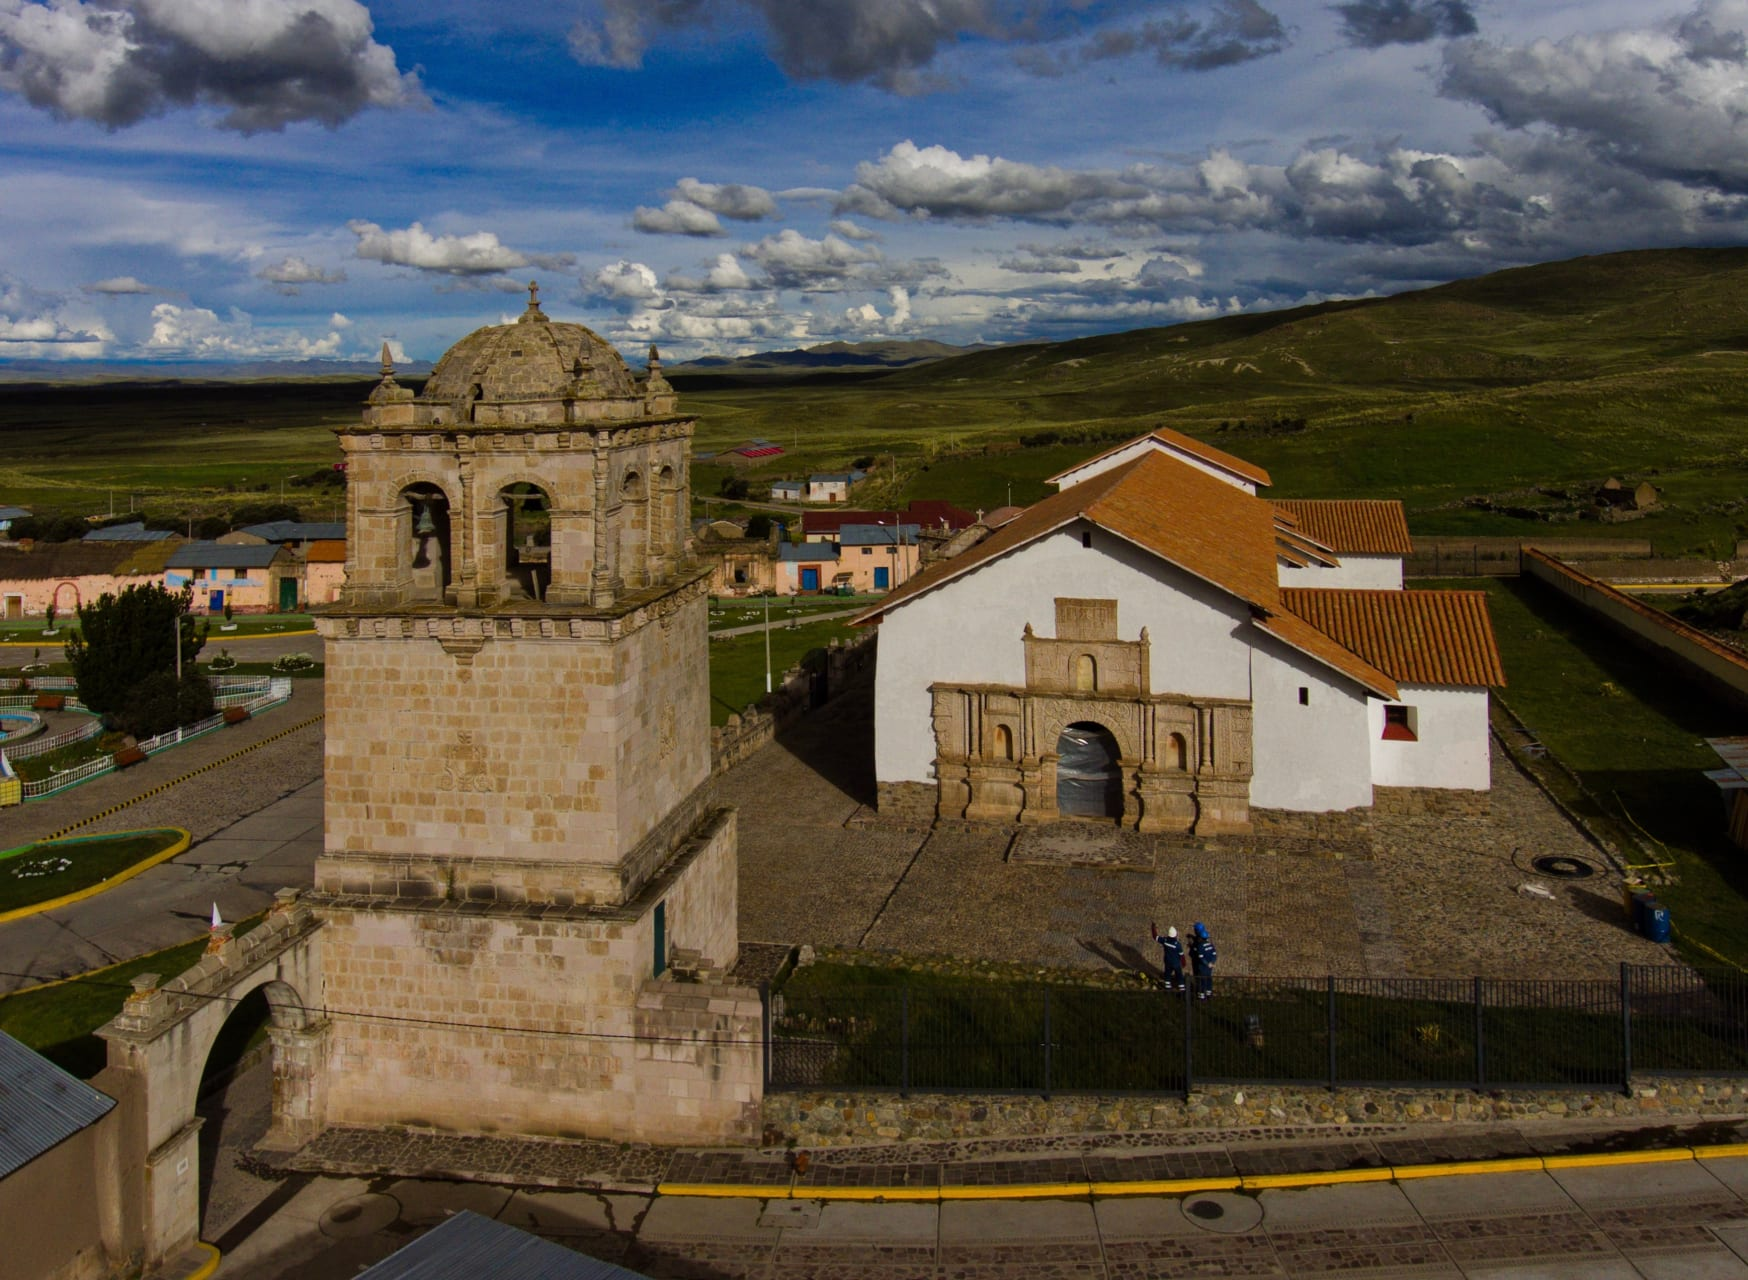 Arequipa - Coporaque Village: ACharming Town in a Corner ofthe World.